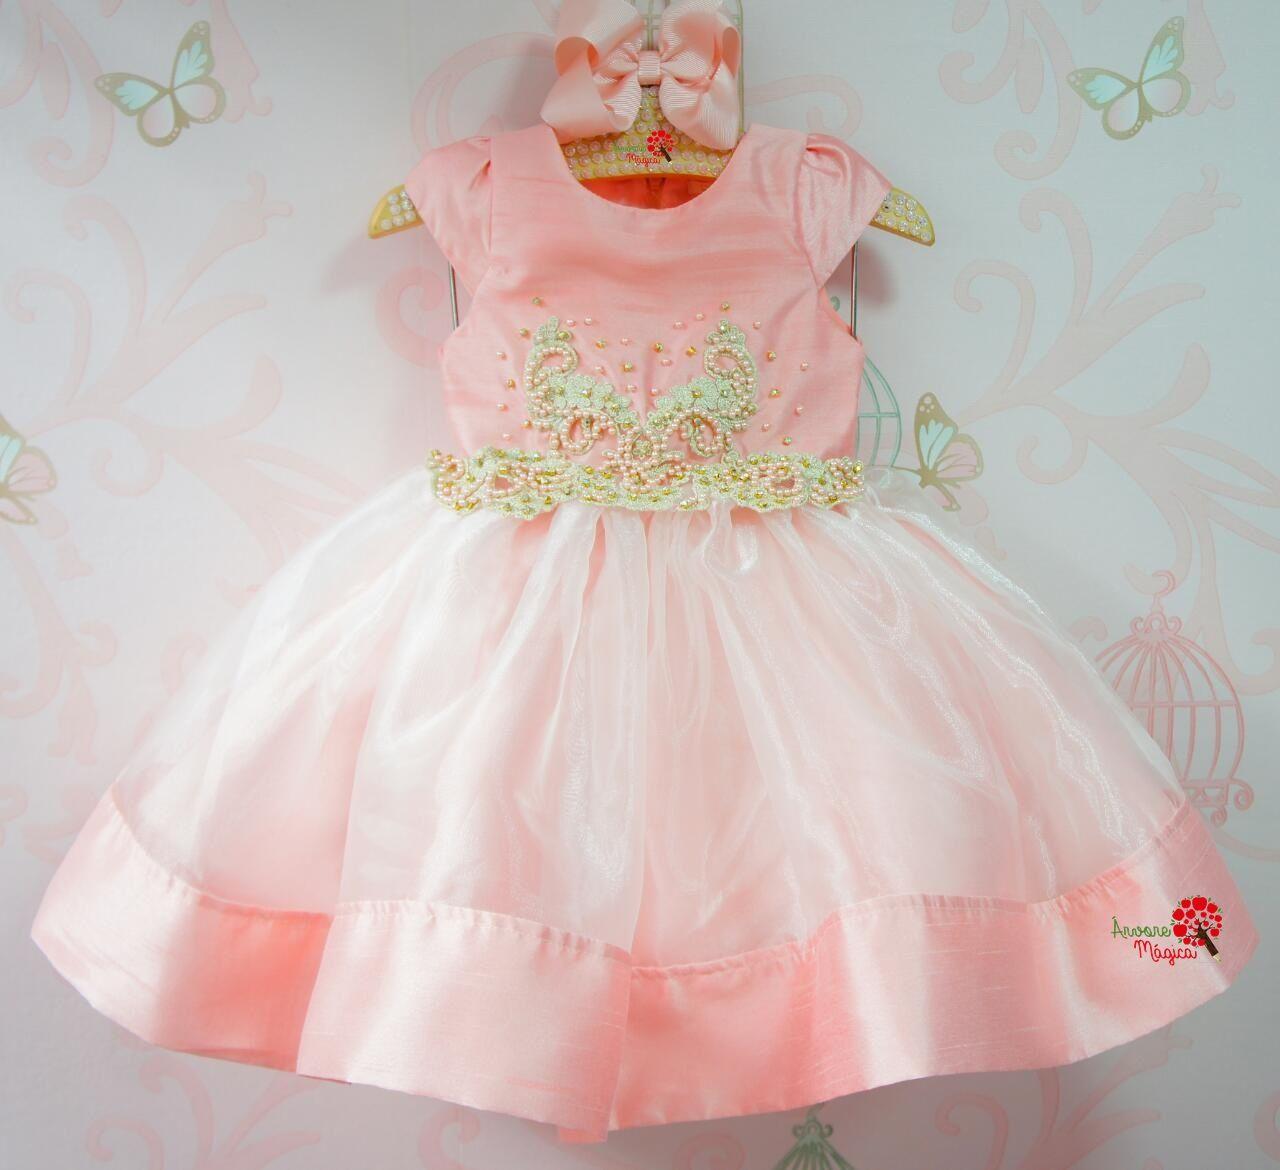 8ed0da2b8 Vestido de Festa Infantil Baile Real Petit Cherie | Vestidos de ...